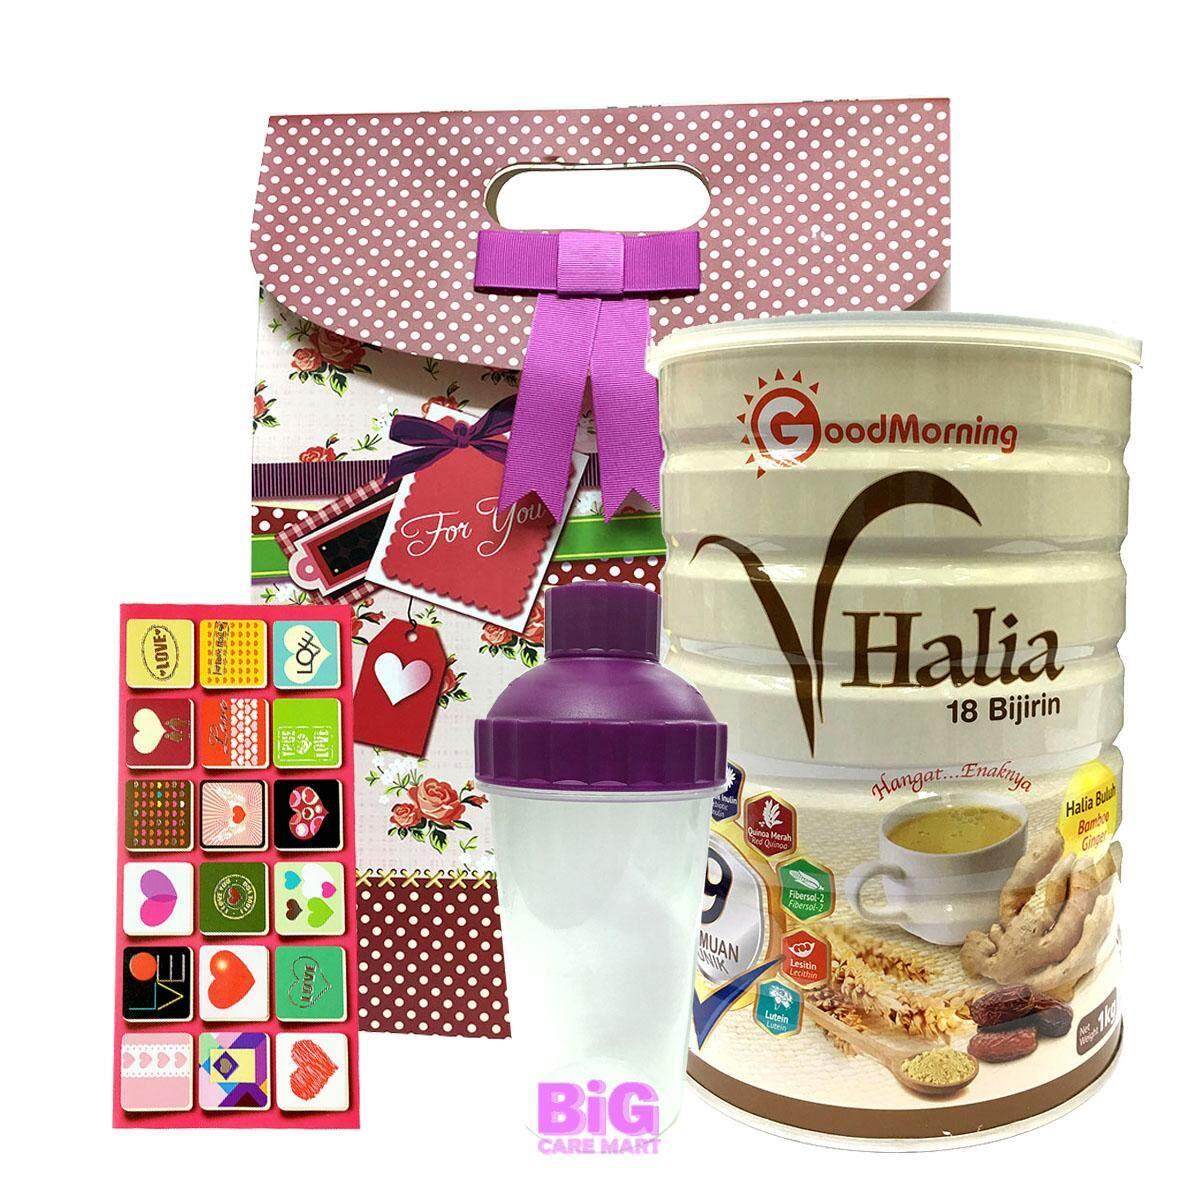 Mother's Day Good Morning Vhalia 1kg (Bag+Shaker+Card)